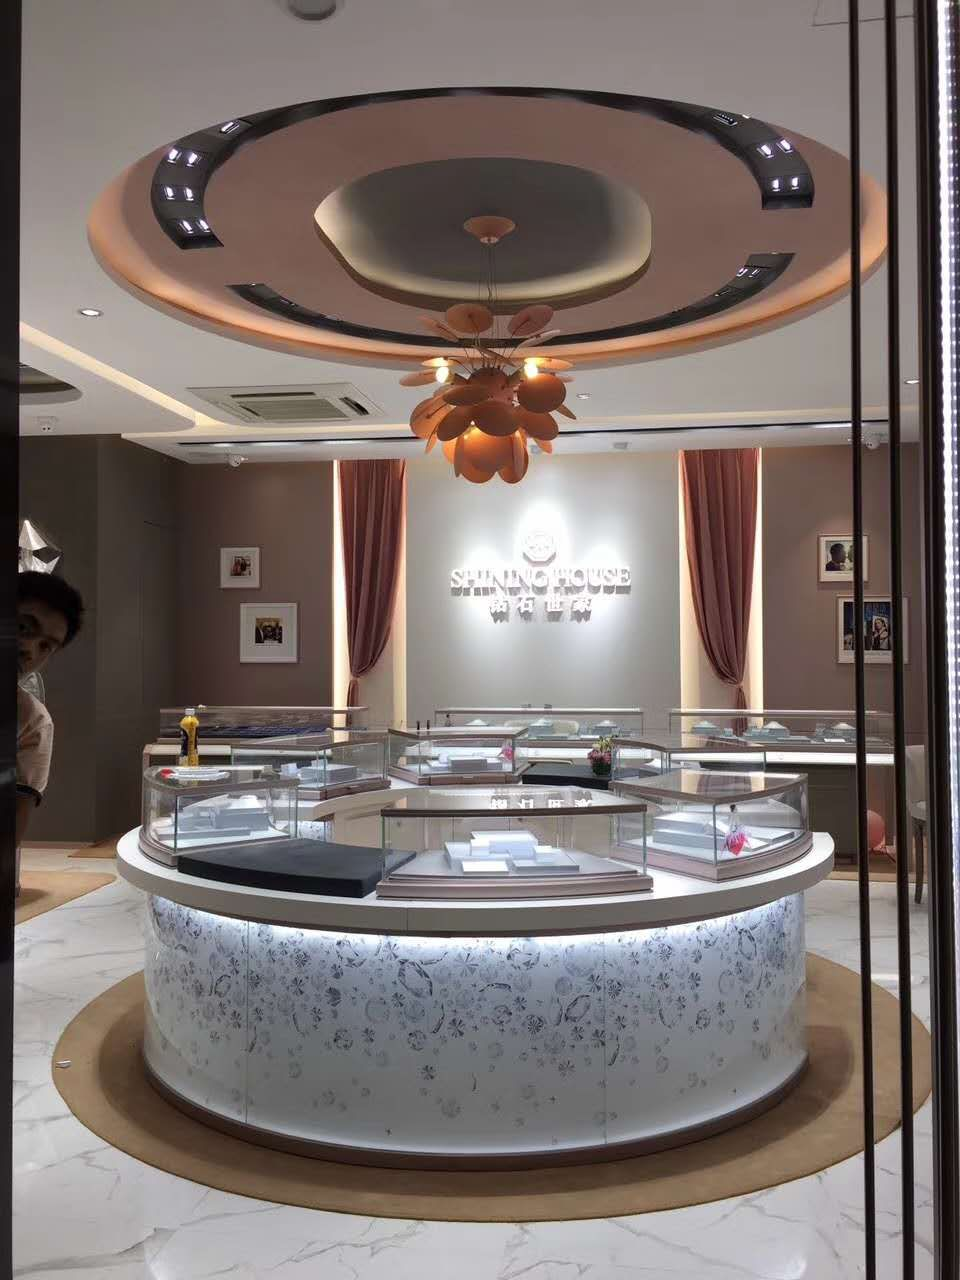 Design house jewelry - Shining House Jewelry Store Design Retail Retaildesign Interior Vm Windowdisplay